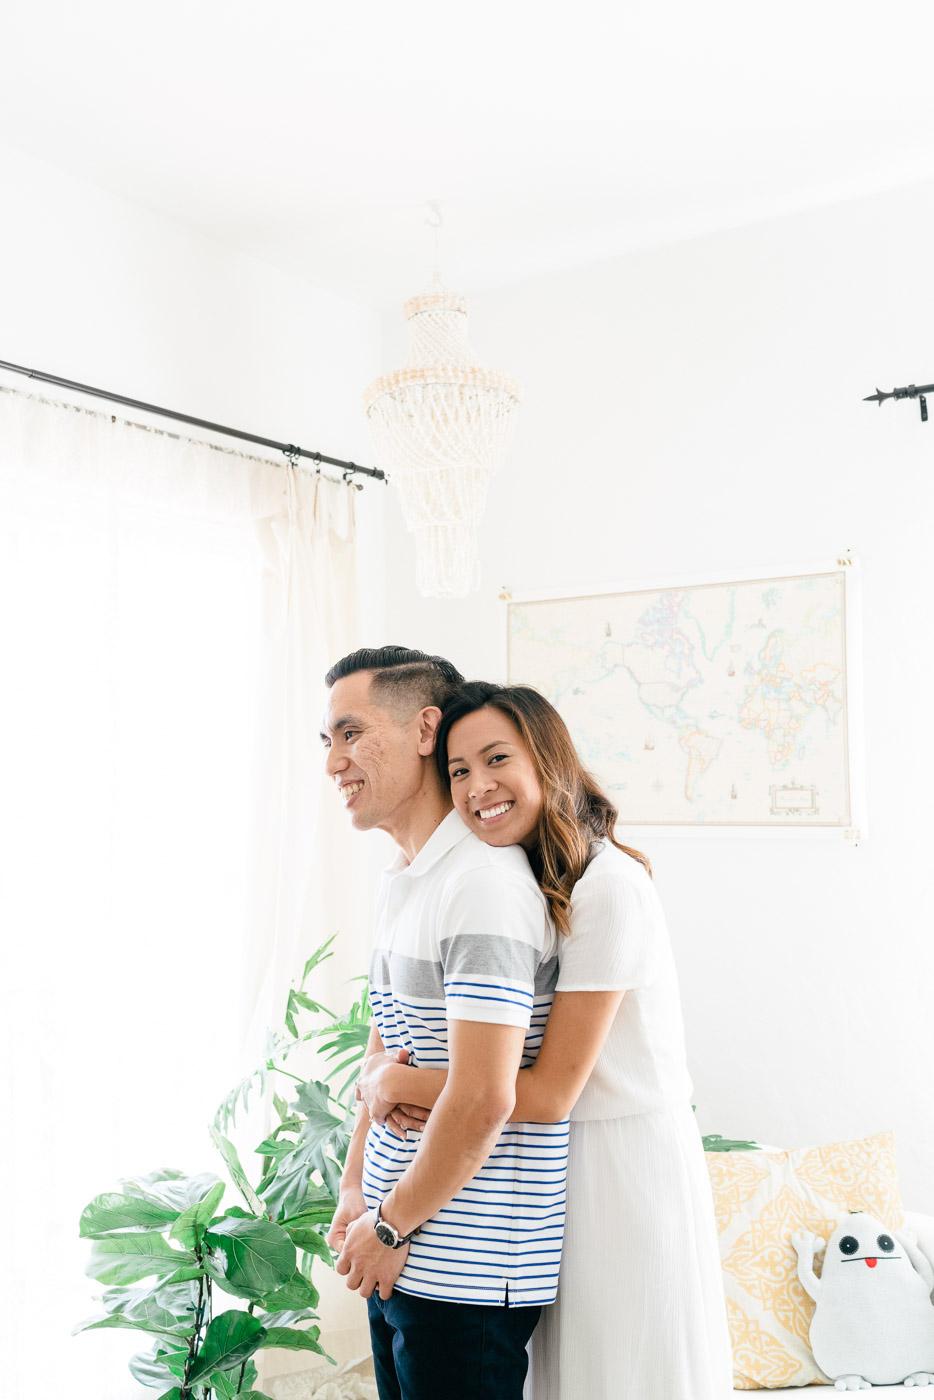 Justin-Leonie-San-Diego-Engagement-Shoot-14